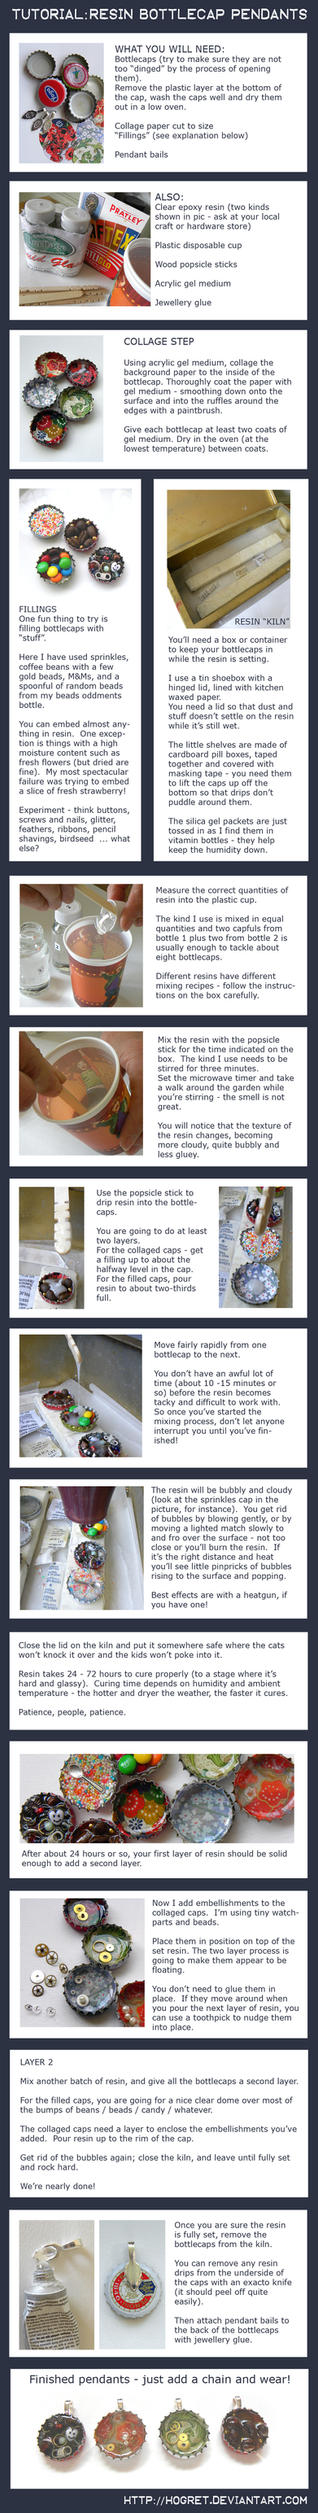 Tutorial: Bottlecap Pendants by hogret